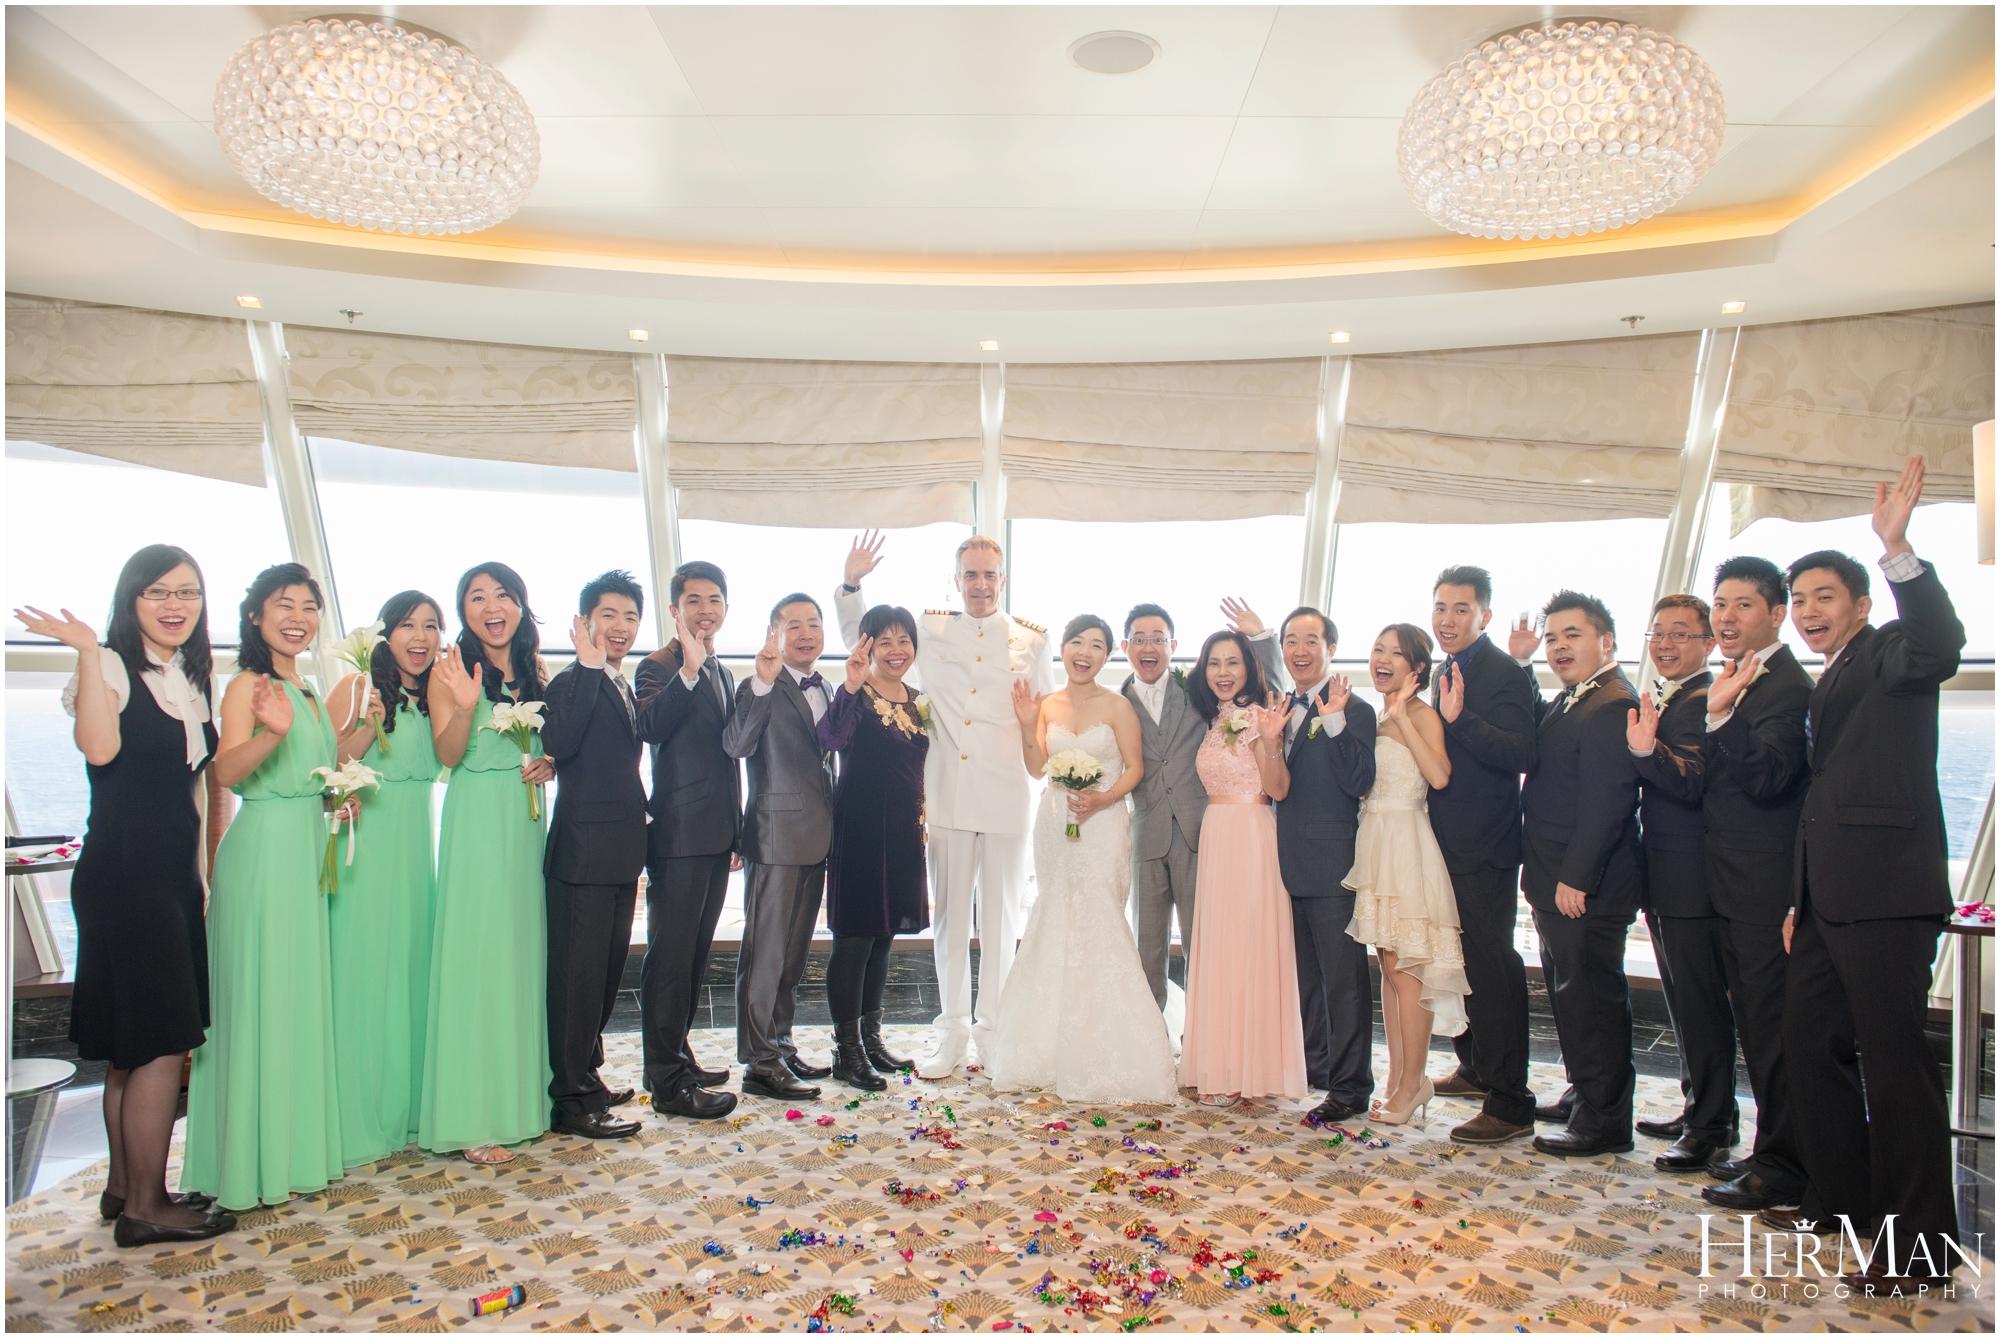 disney-fantasy-cruise-wedding-HerMan-photography_0031.jpg